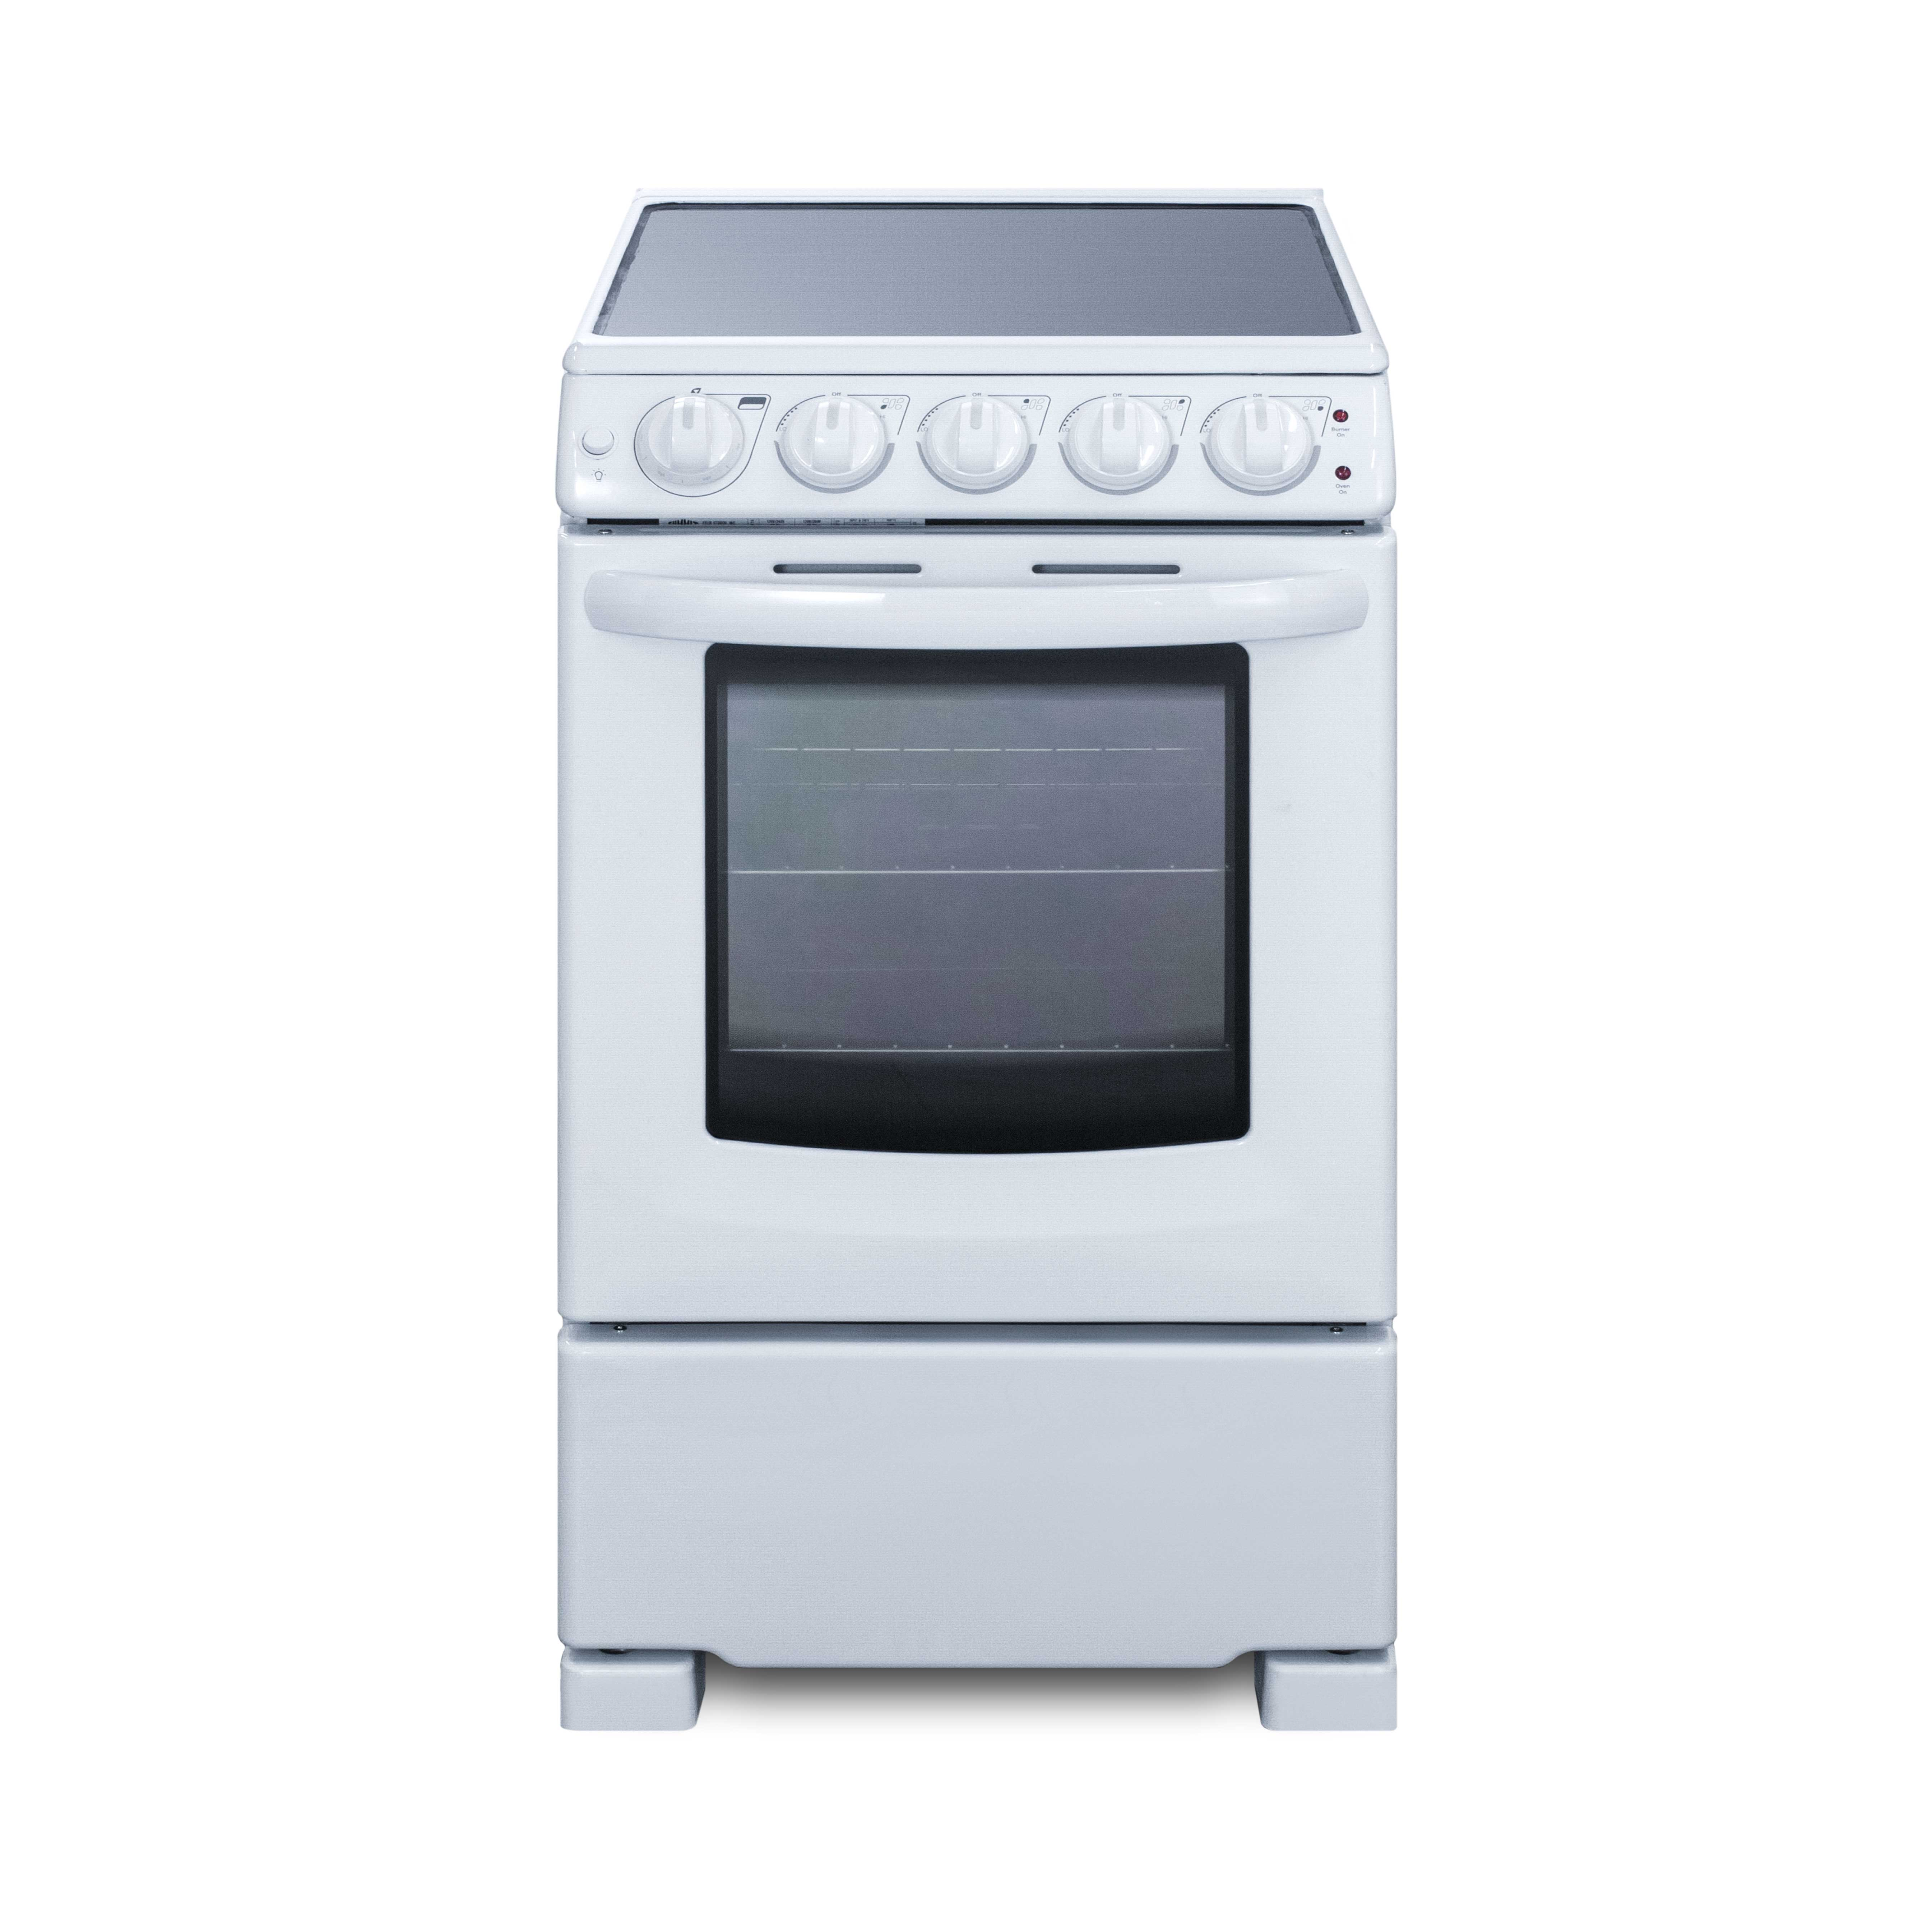 Summit Appliance REX2051WRT range, residential domestic